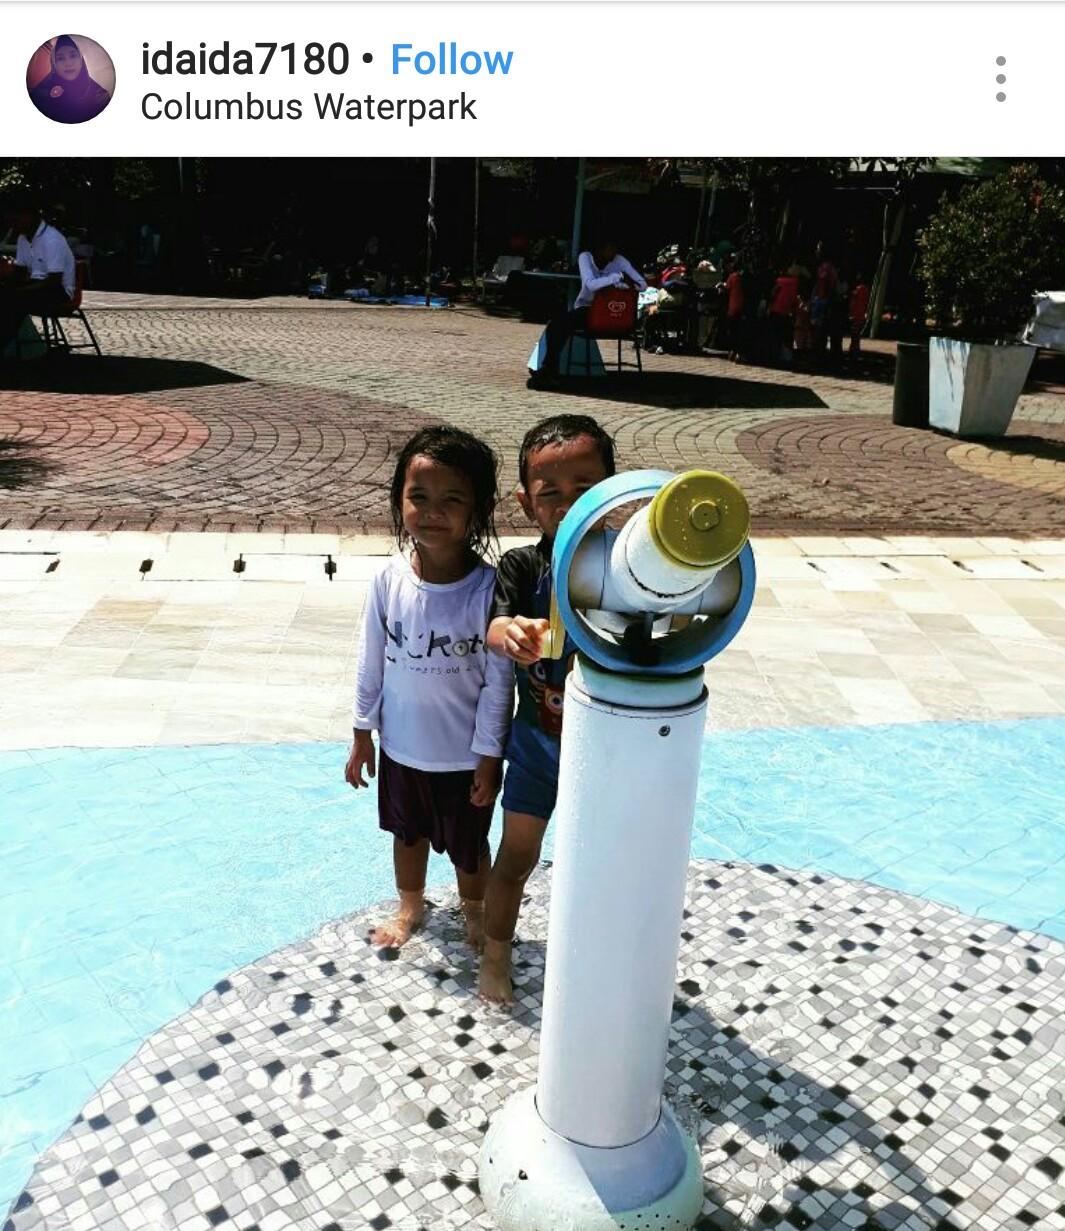 Columbus Waterpark Kids Holiday Spots Liburan Anak Informasi Voucher Tiket Bekasi Liburananak Columbuswaterpark Lokasi